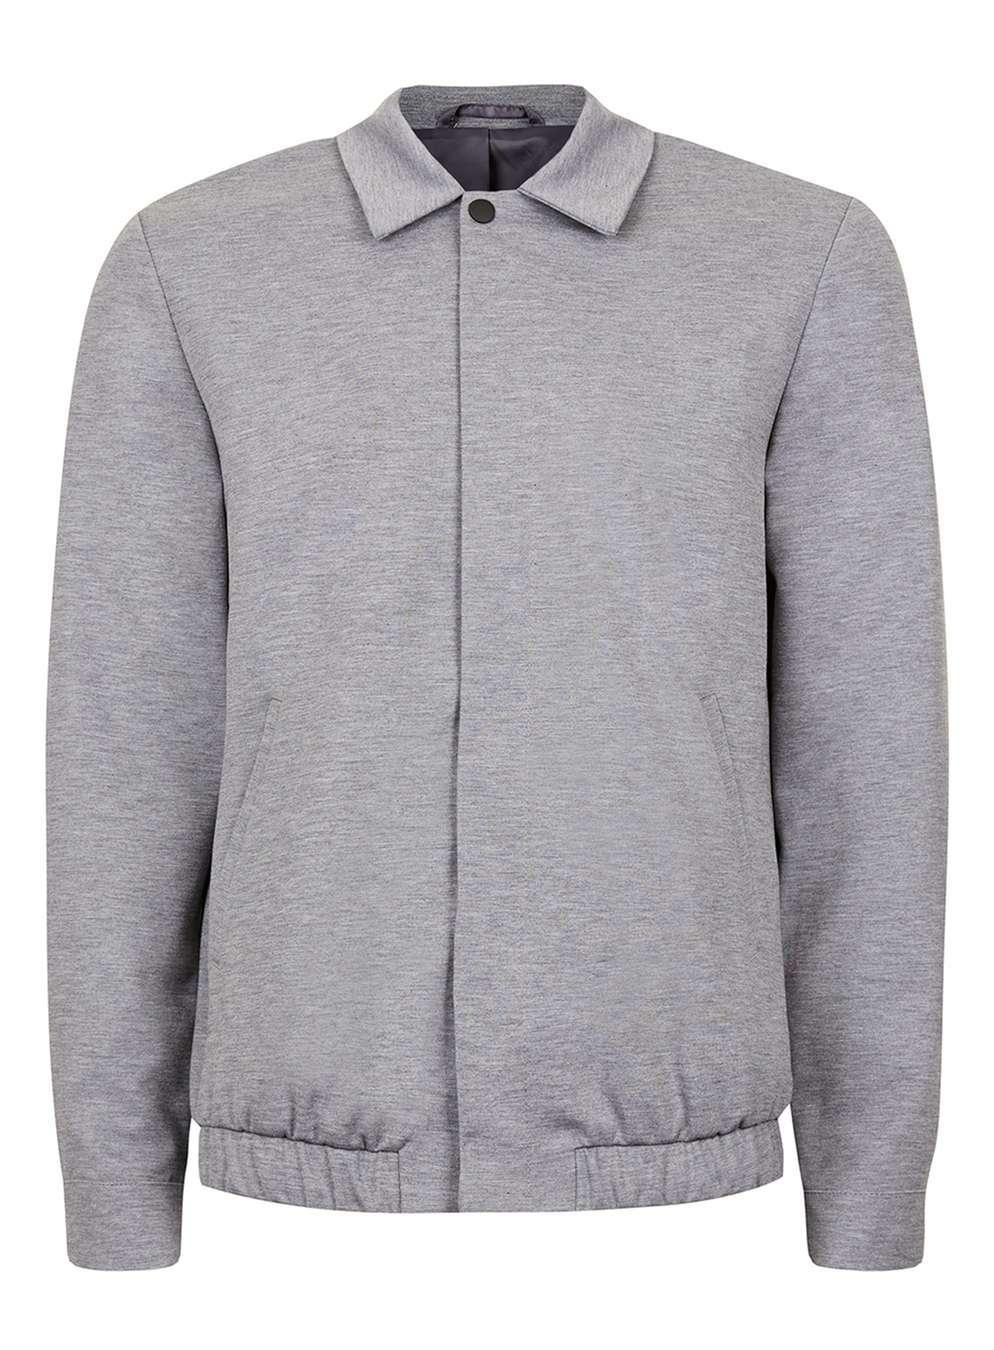 Light Grey Coach Jacket, £65 ( topman.com )